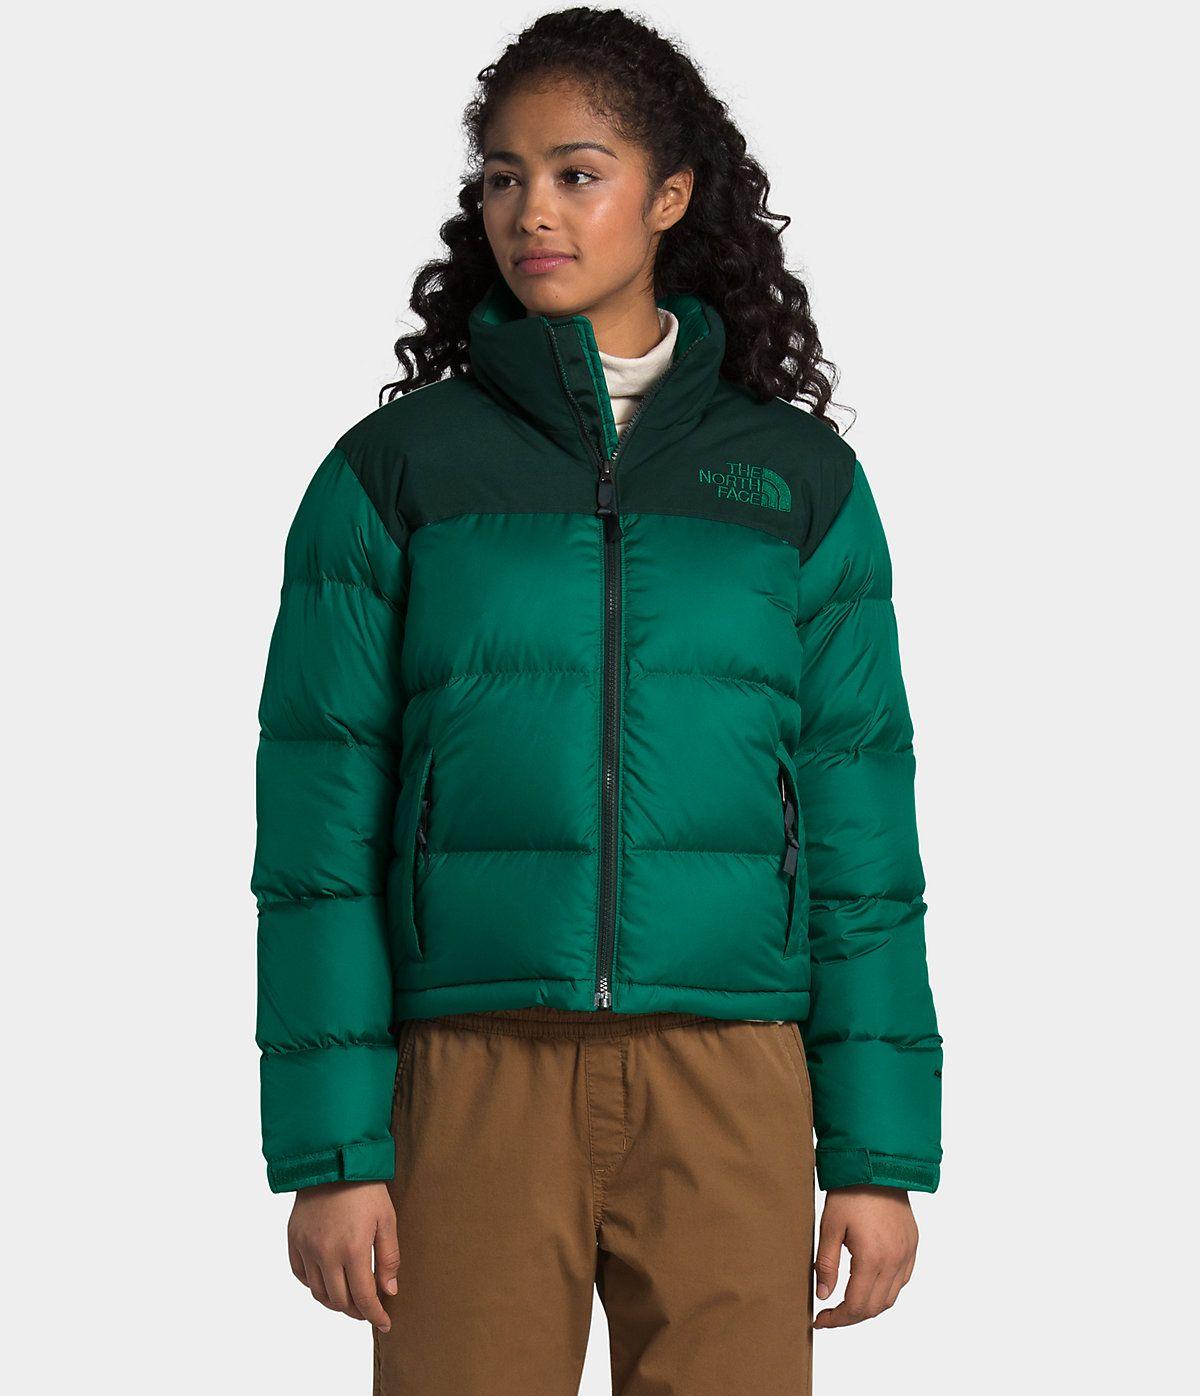 Women S Eco Nuptse Jacket The North Face North Face Puffer The North Face North Face Women [ 1396 x 1200 Pixel ]